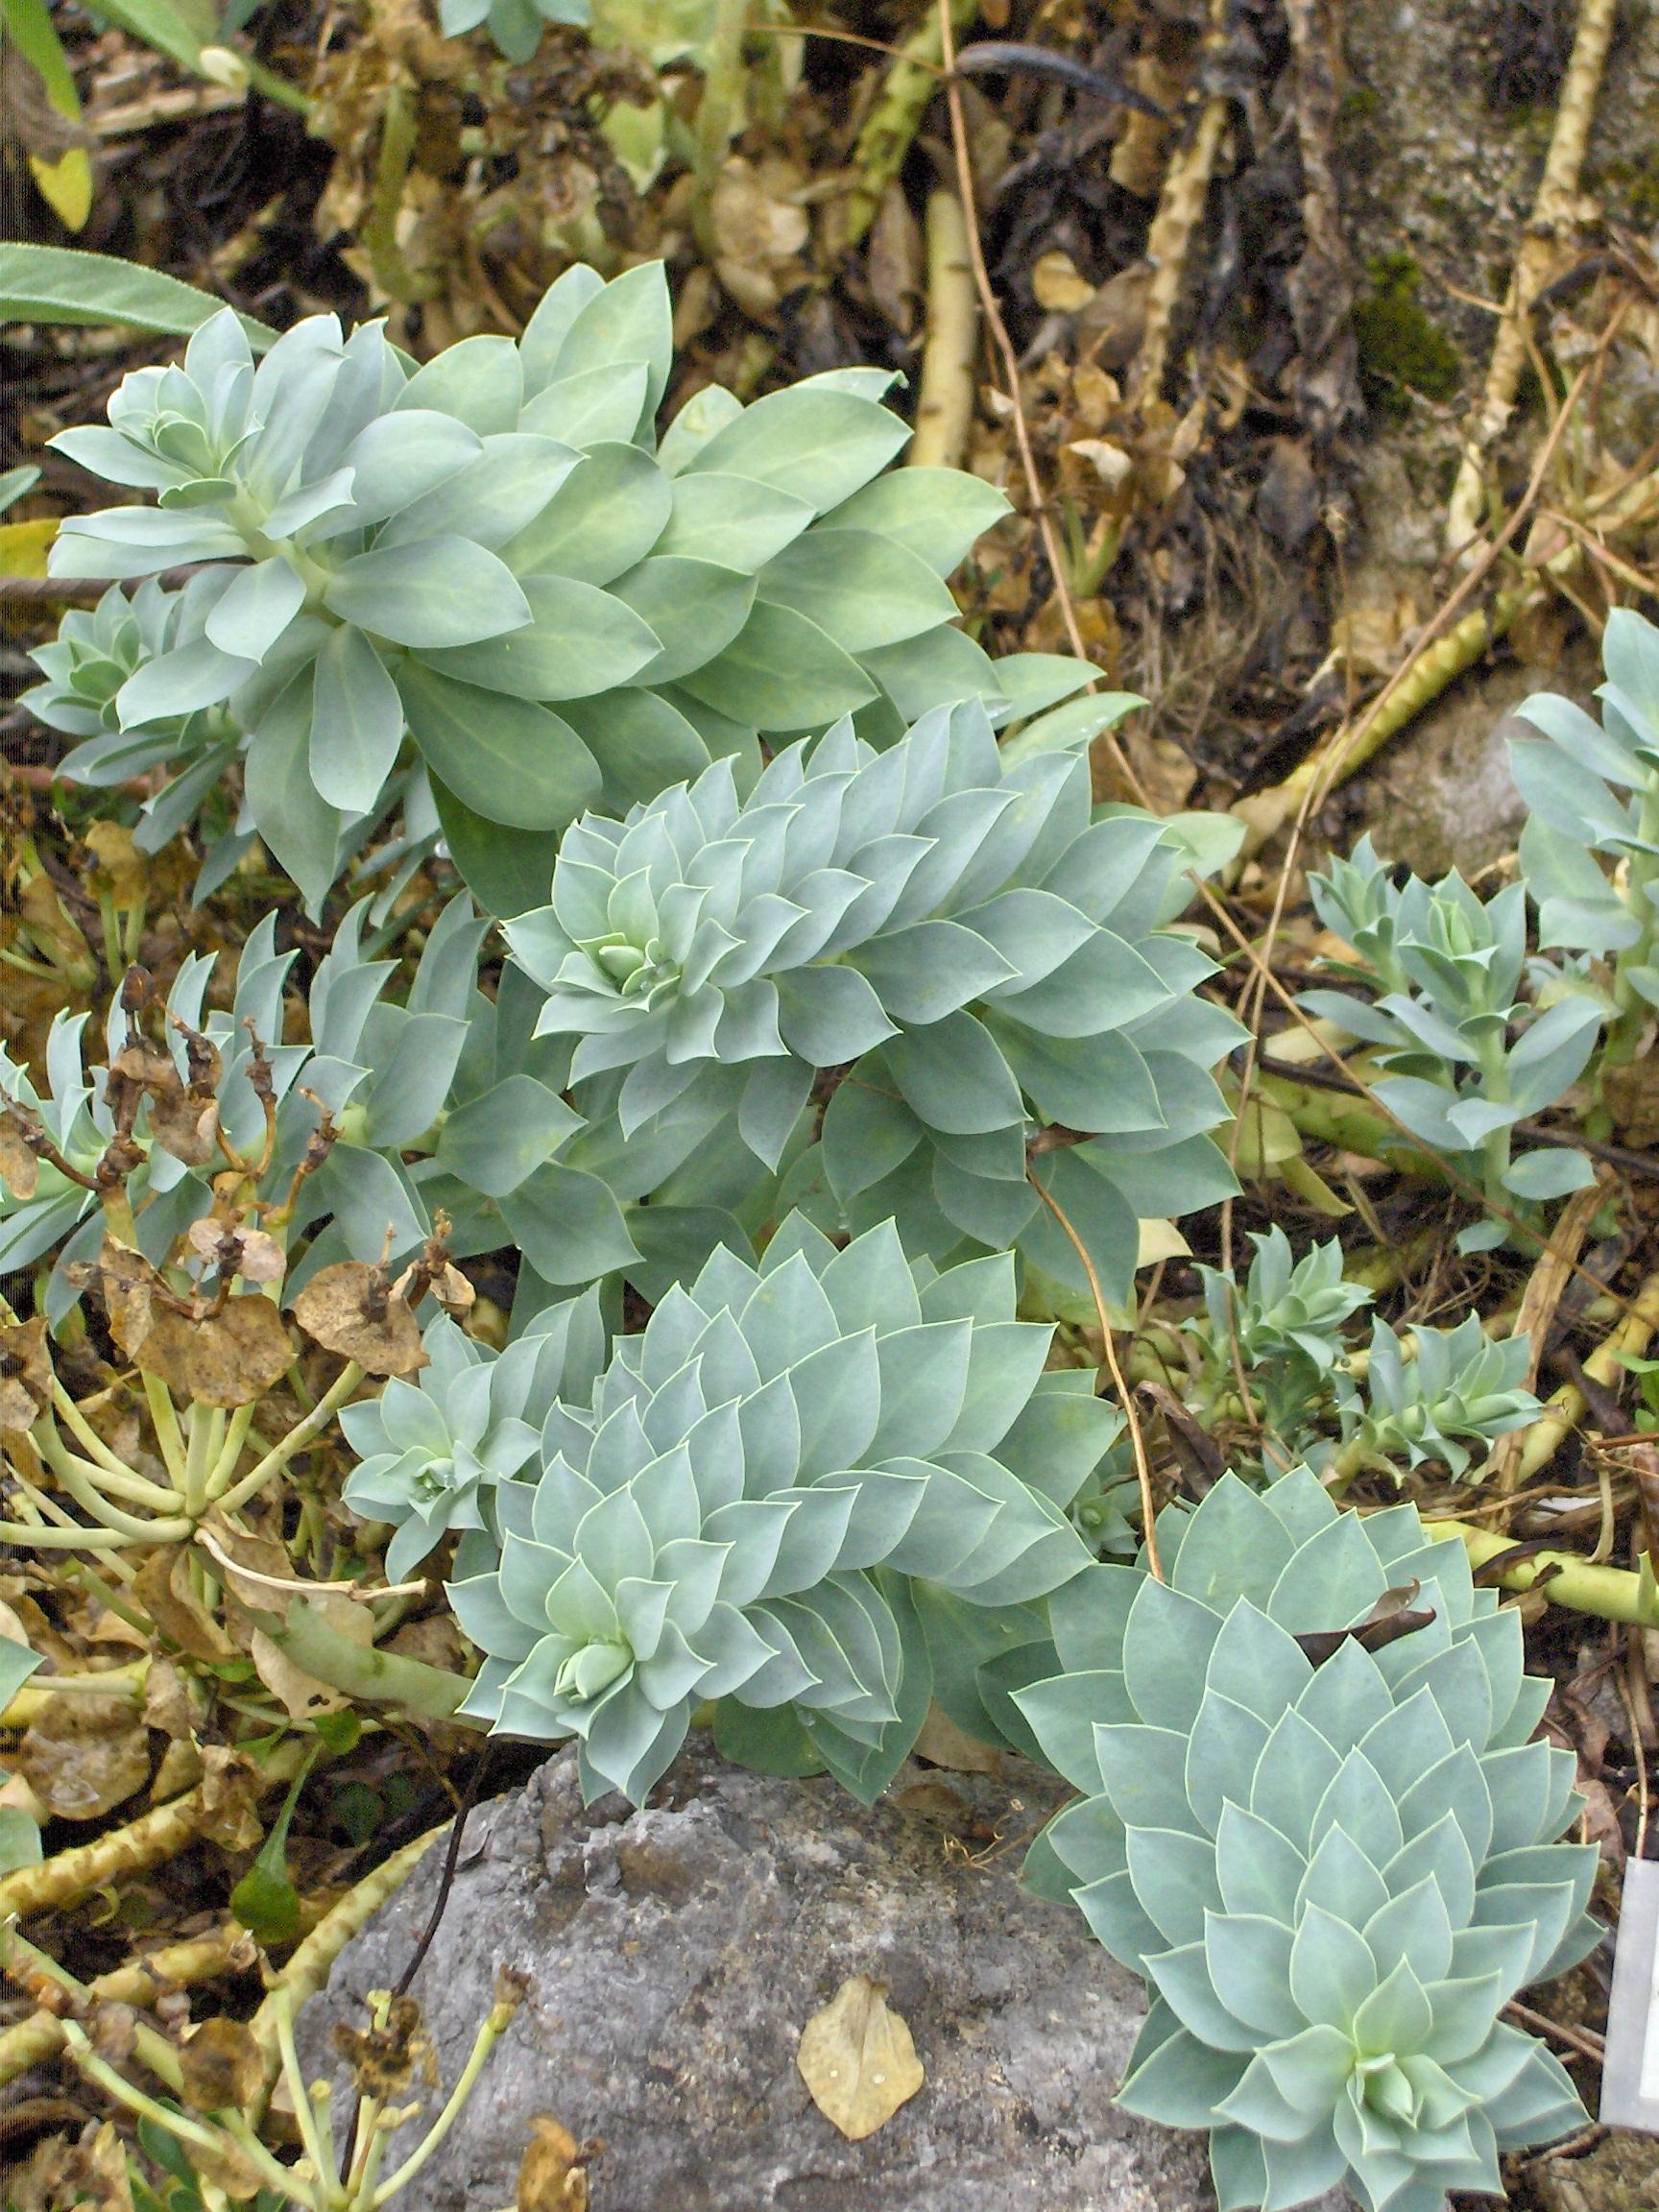 Euphorbia meloformis ssp validating